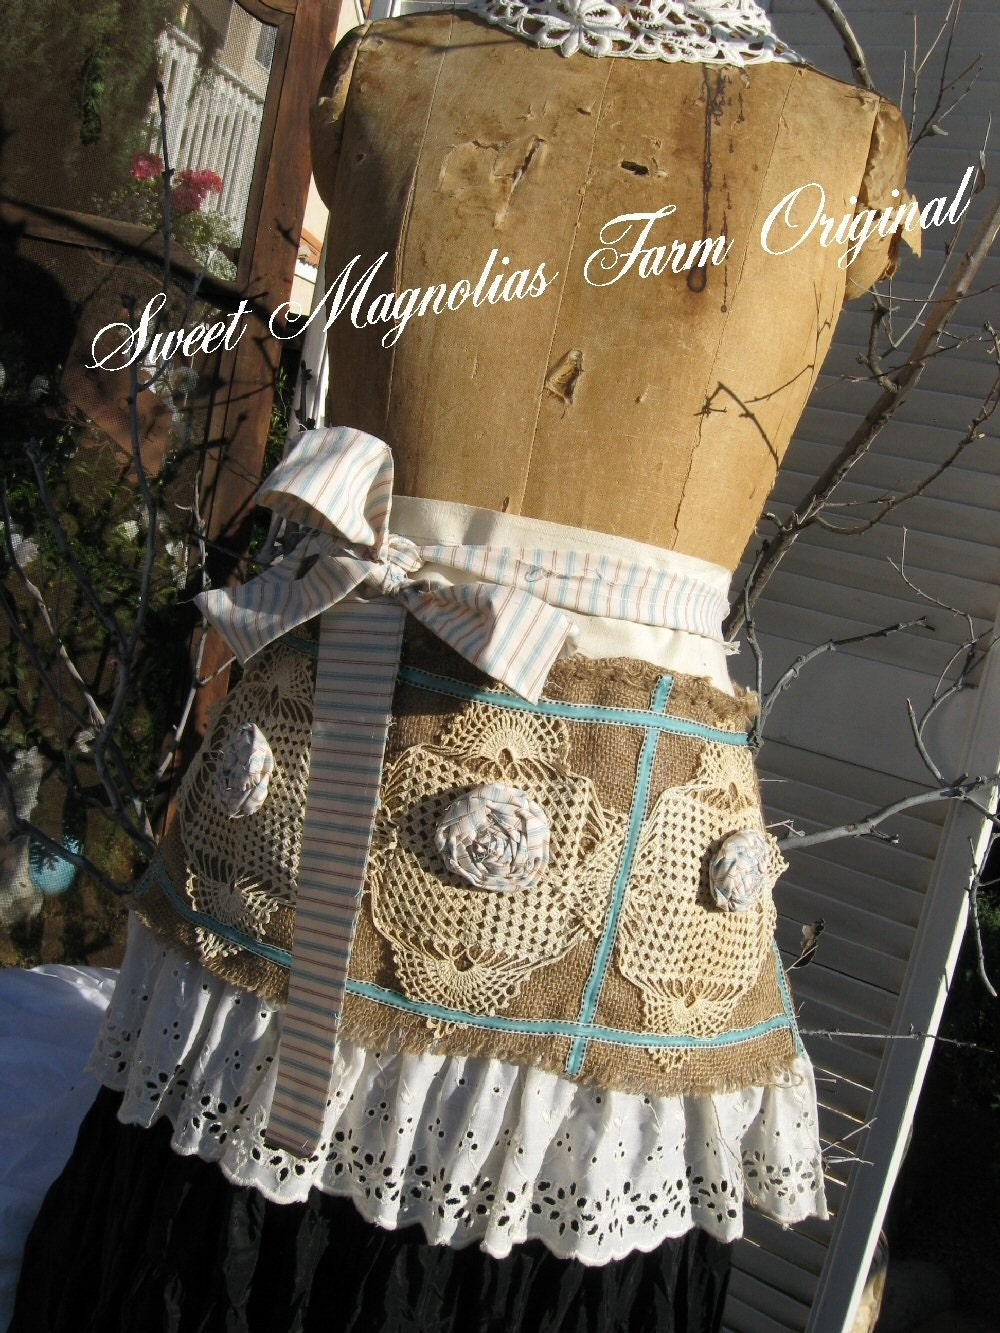 The Charming Farm Girl Custom Apron ..4 the Vintage Girl